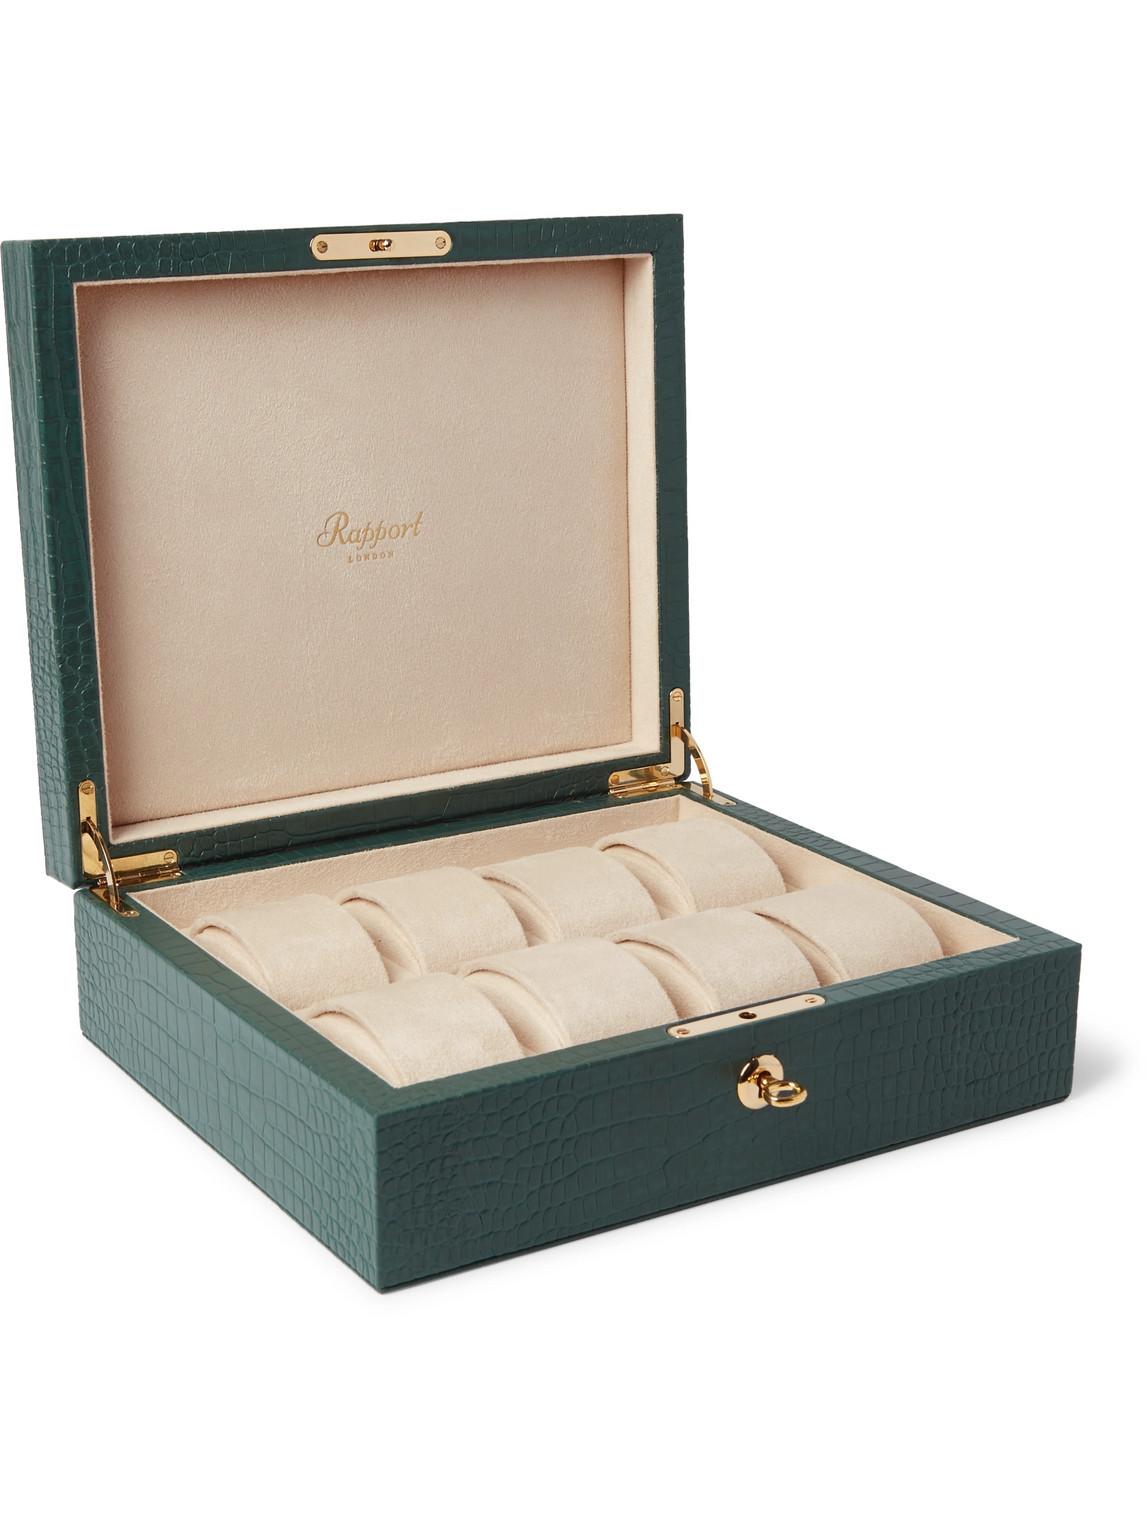 rapport london - croc-effect leather watch box - men - green